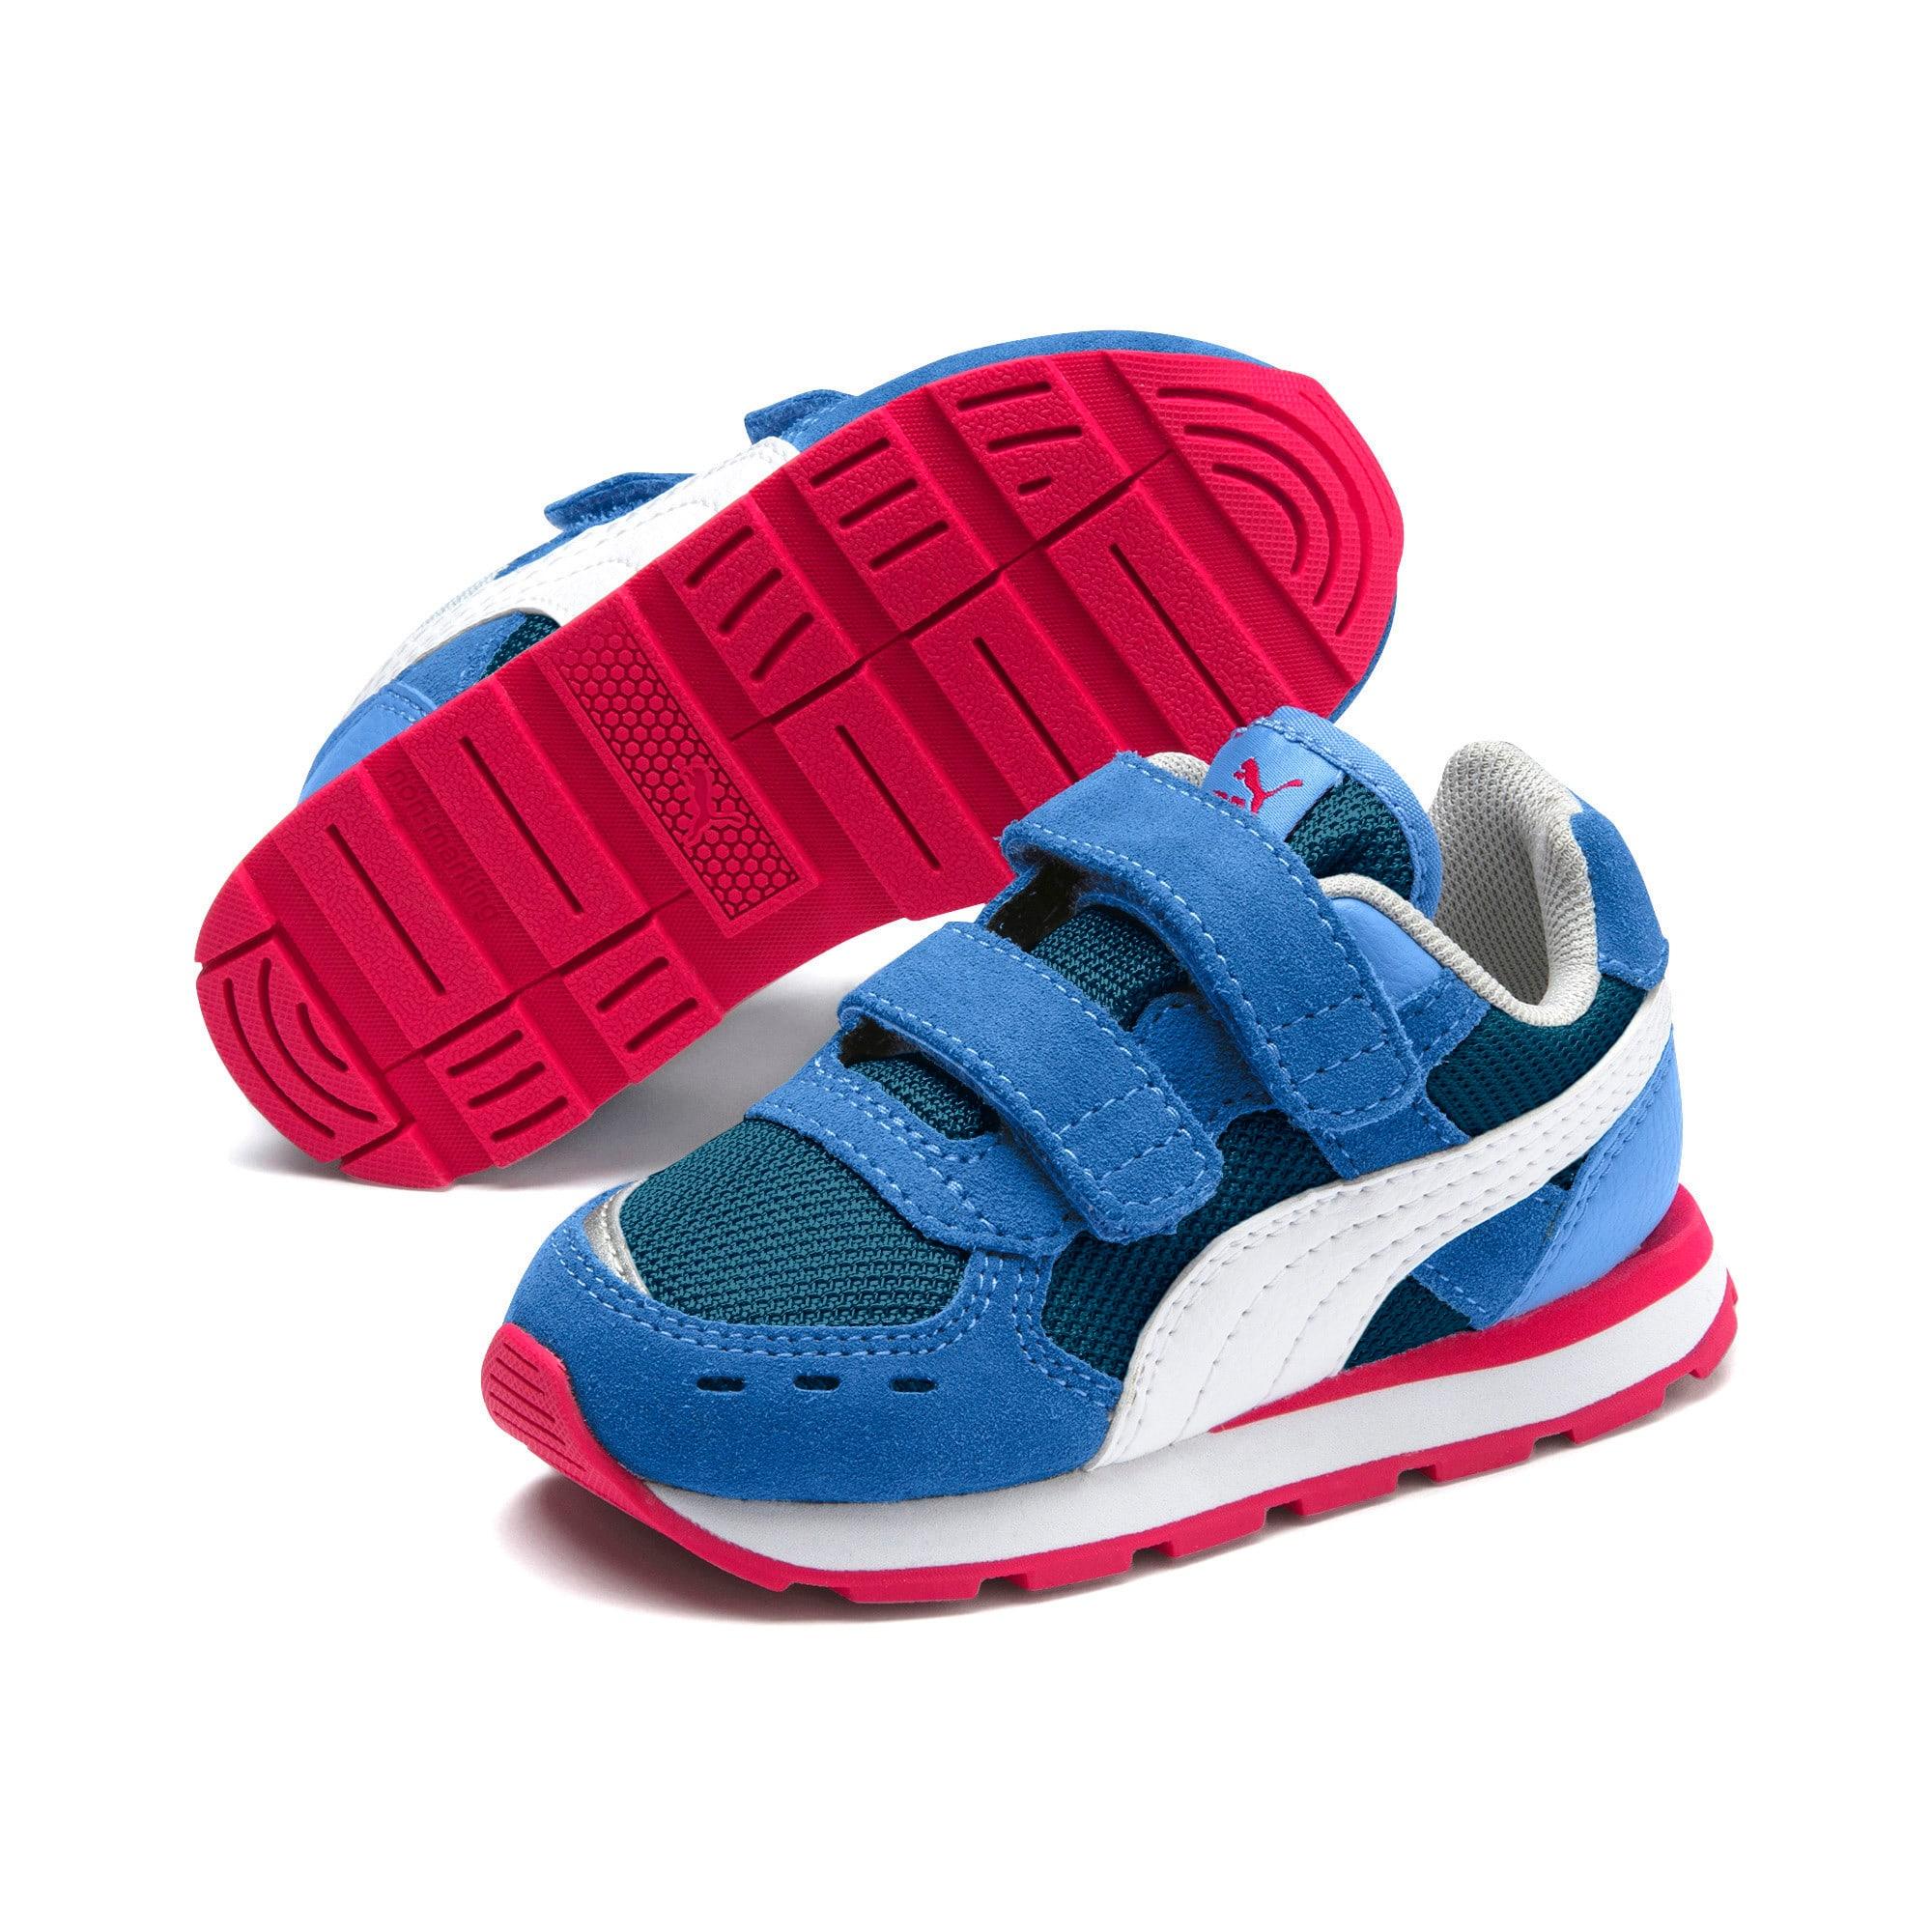 Thumbnail 2 of Vista Toddler Shoes, Ultramarine-Puma White, medium